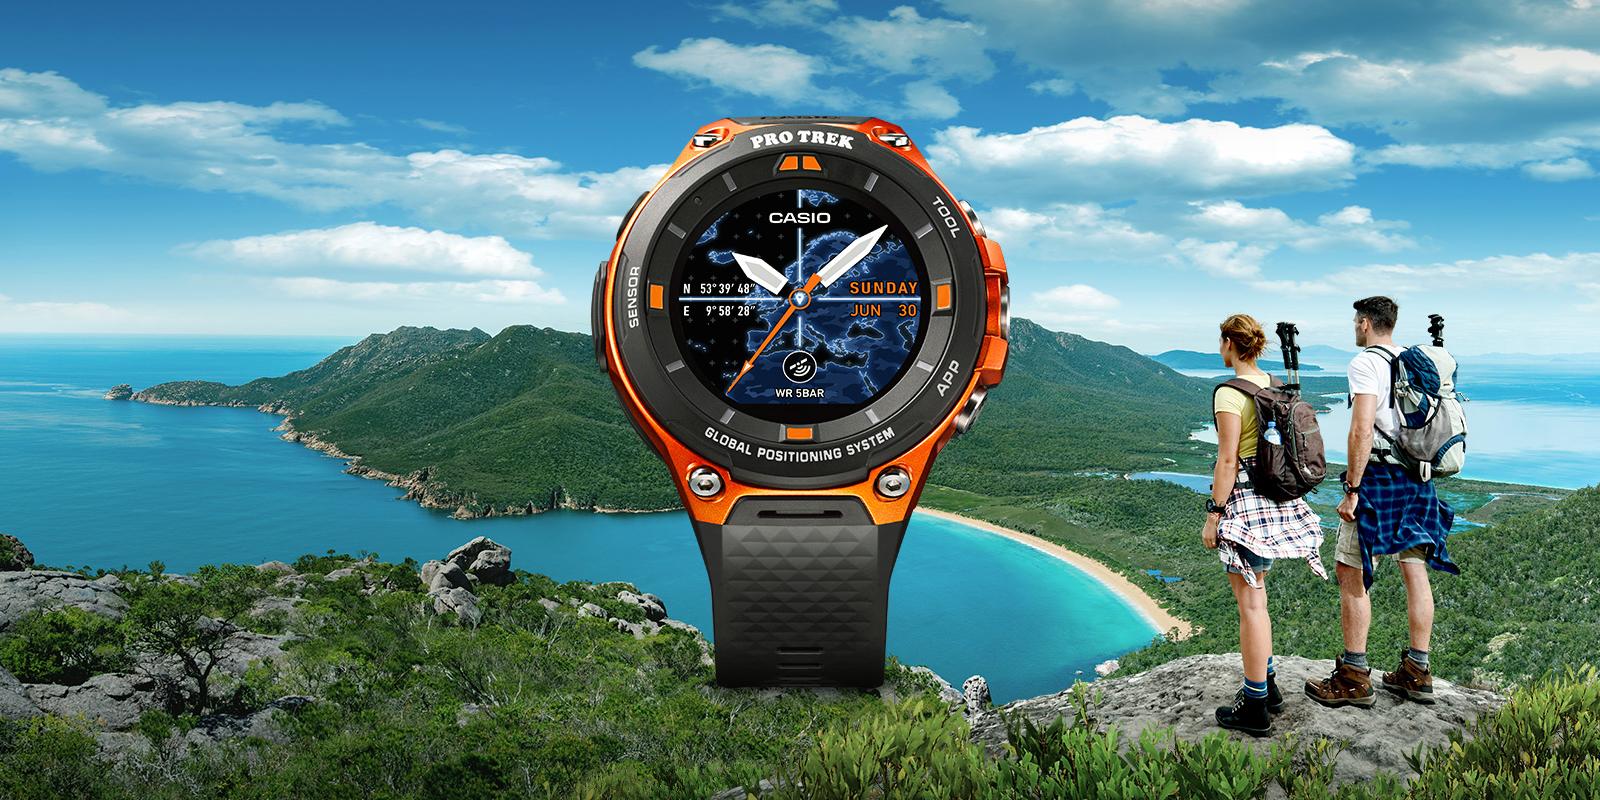 misterwatch-orologio-casio-pro-tek